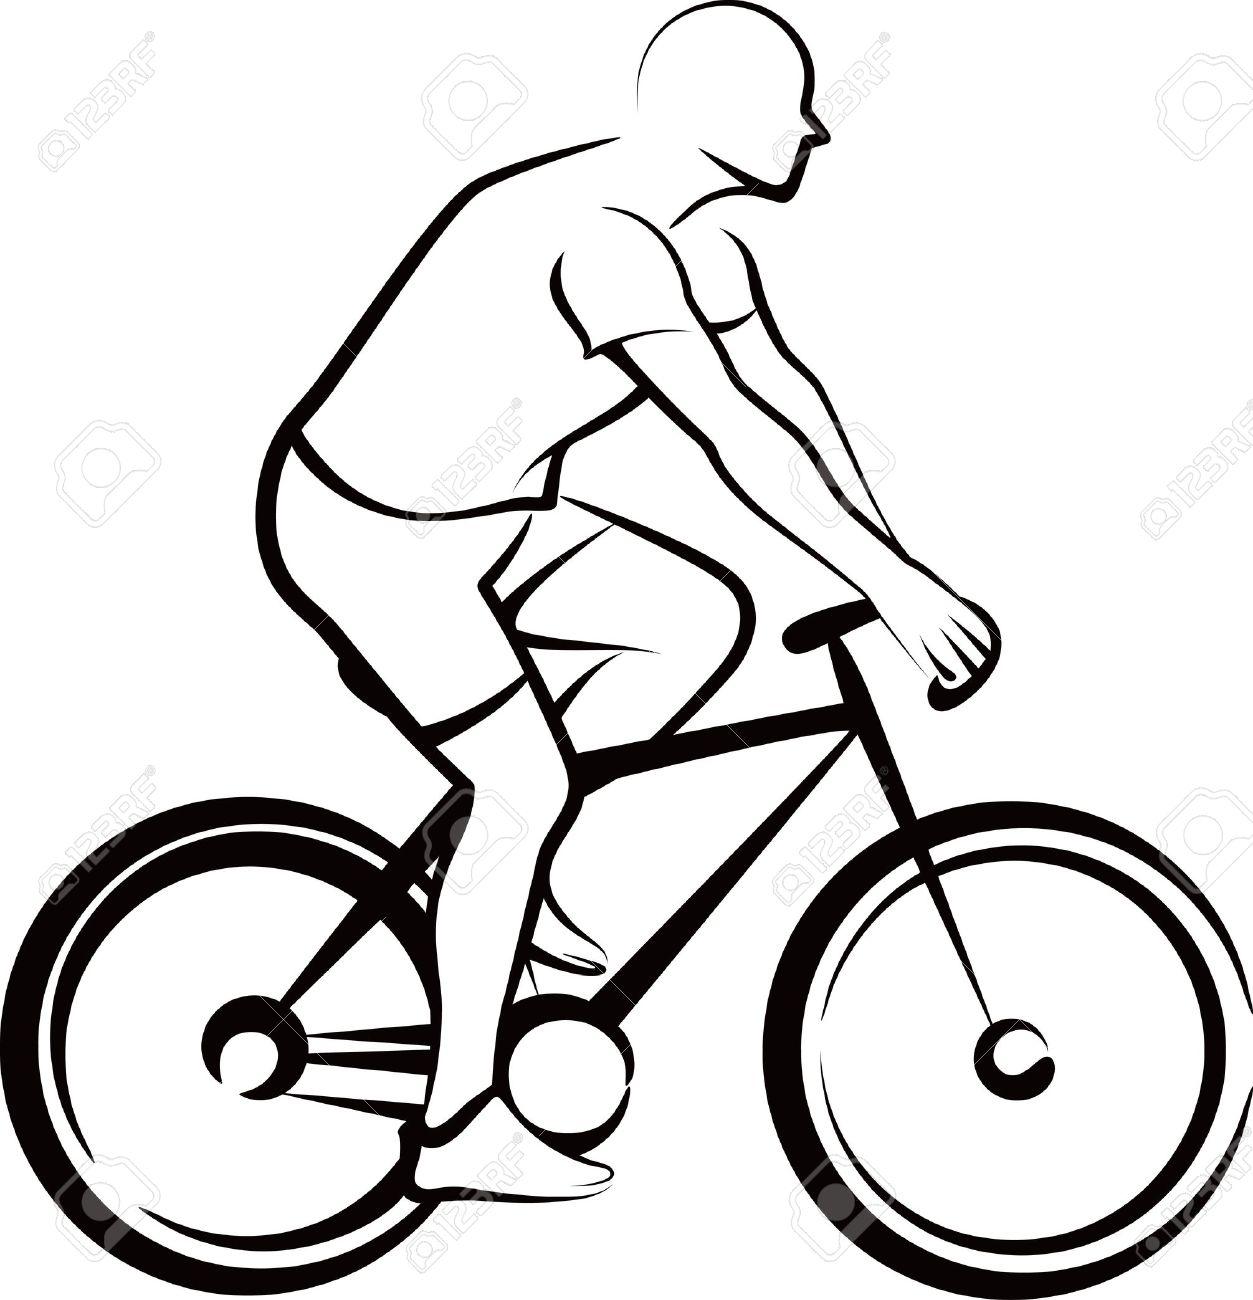 1253x1300 Simple Dirt Bike Drawing Riding Bike